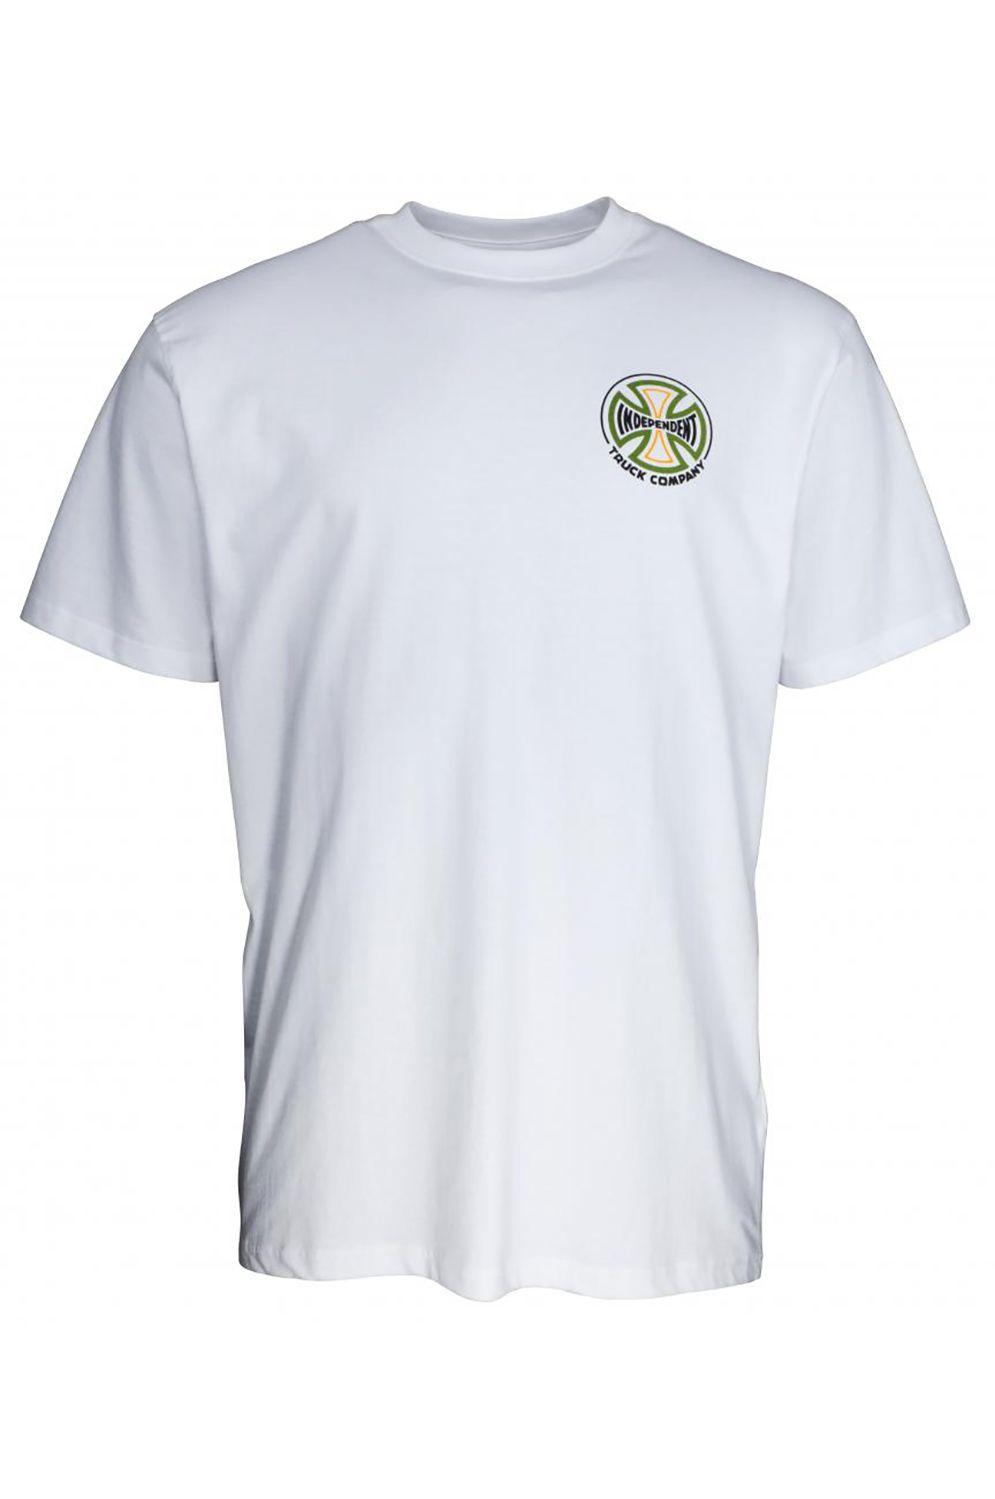 T-Shirt Independent CONVERGE T-SHIRT White